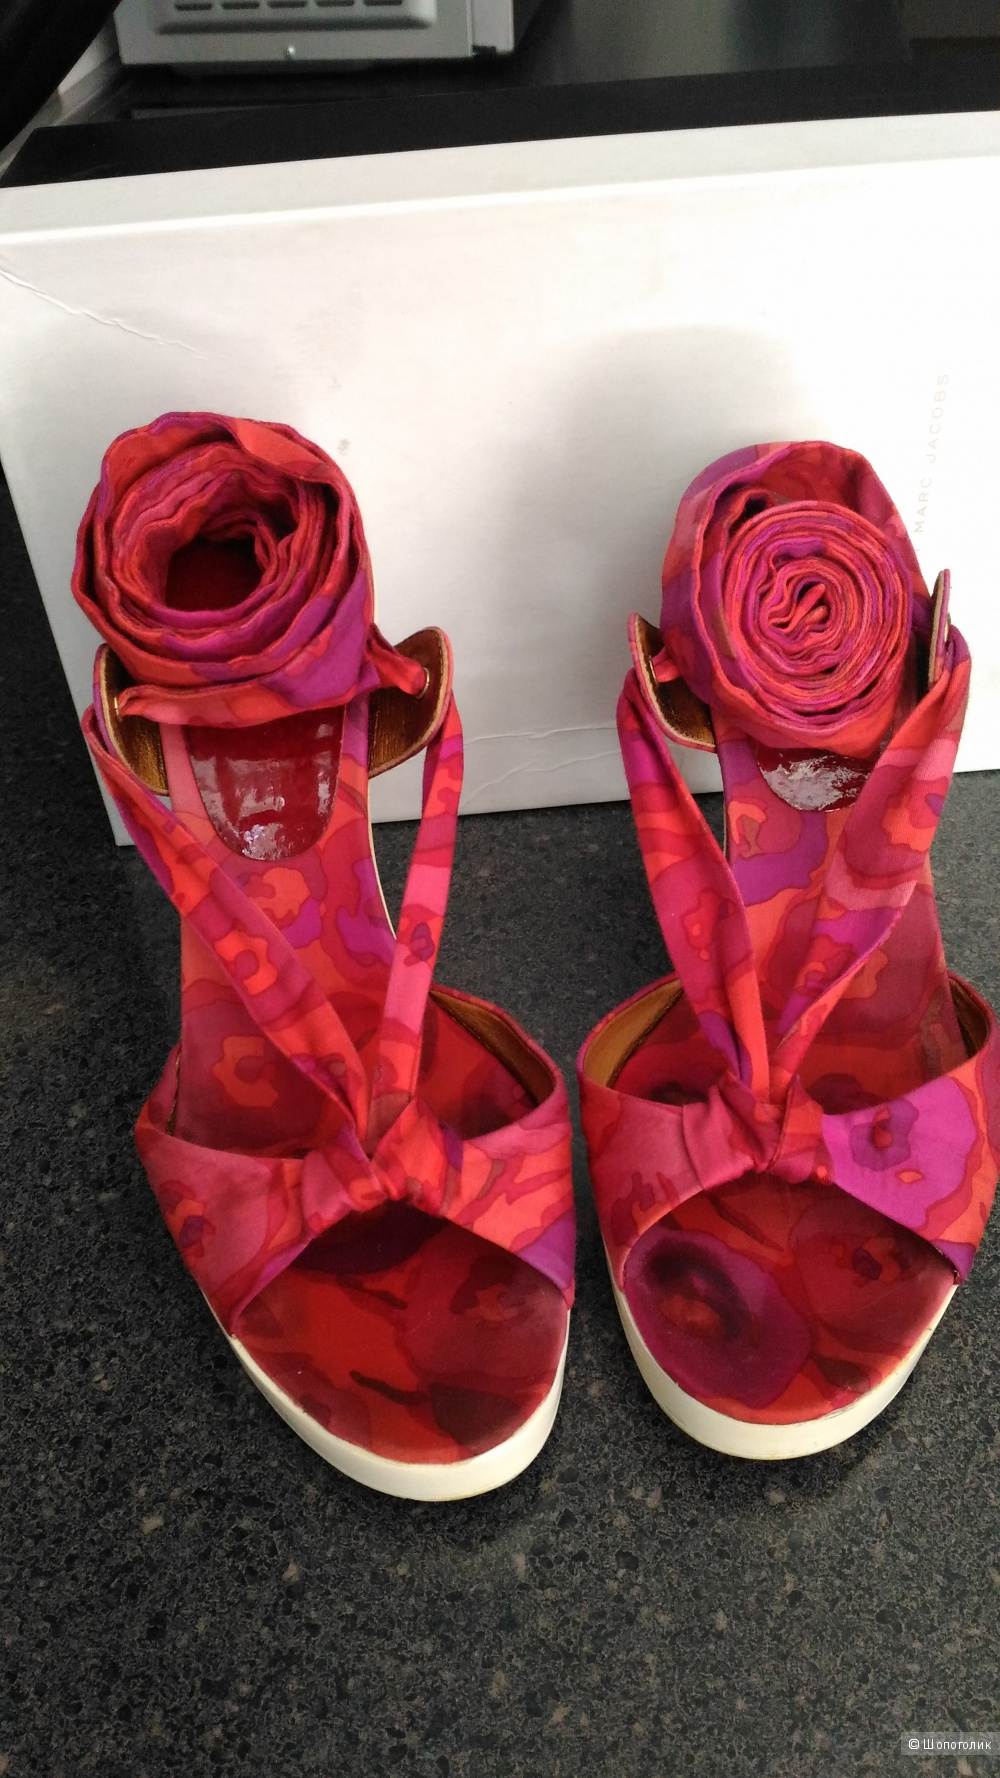 Летние туфли, босоножки, Marc by Marc Jacobs, 38 размер